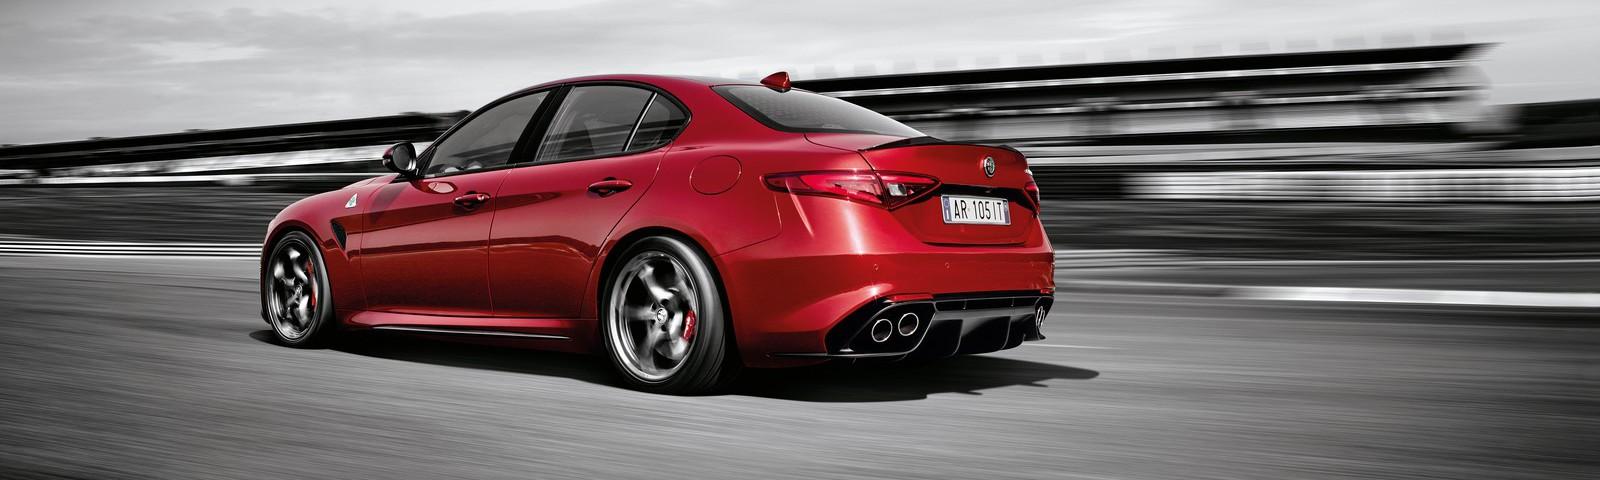 Alfa-Romeo-Giulia-QV-Live-16